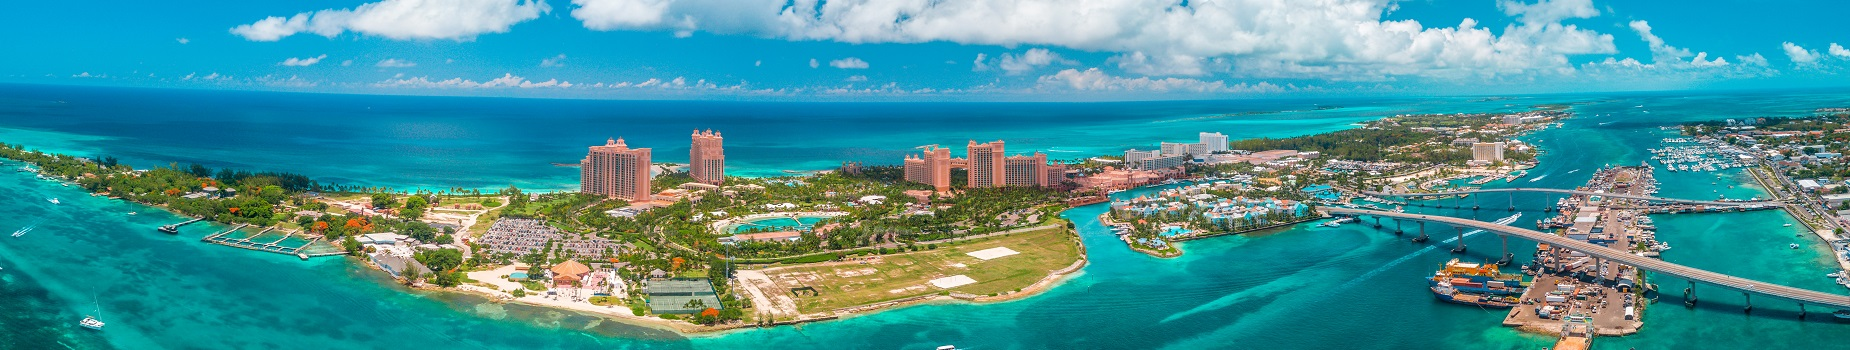 Vliegvelden Bahama's